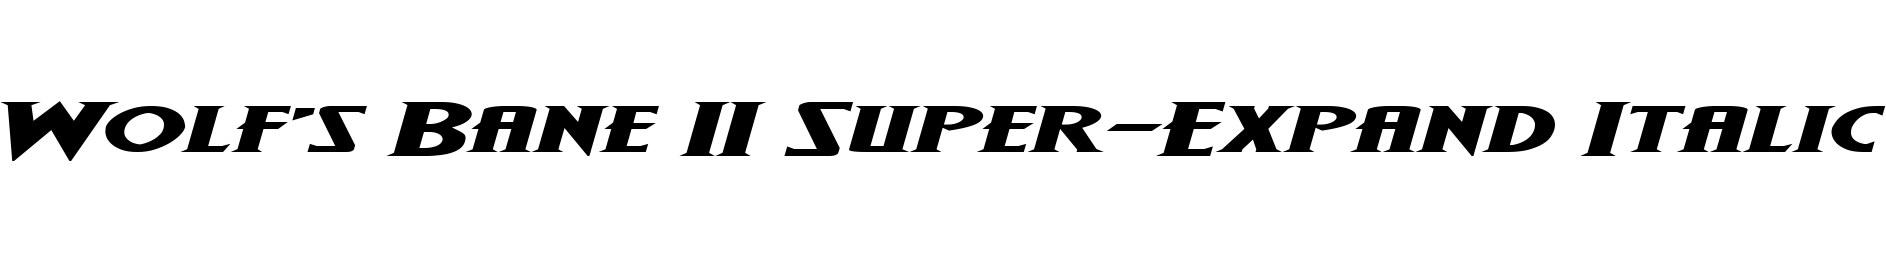 Wolf's Bane II Super-Expand Italic